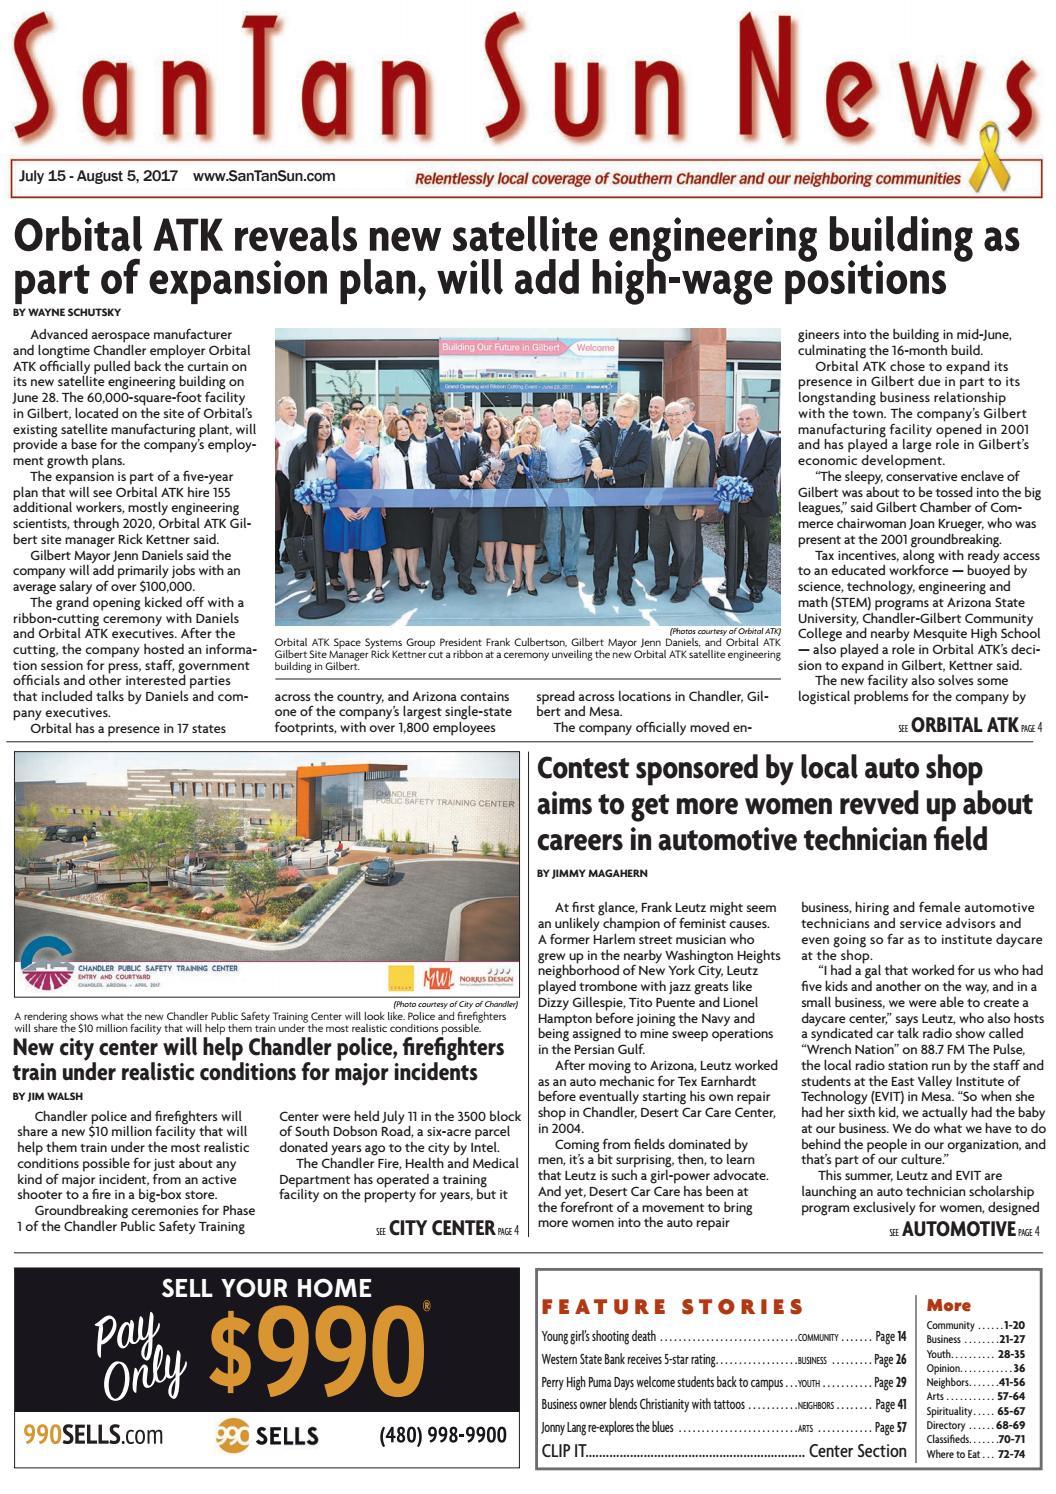 Santan Sun News July 15 2017 By Times Media Group Issuu